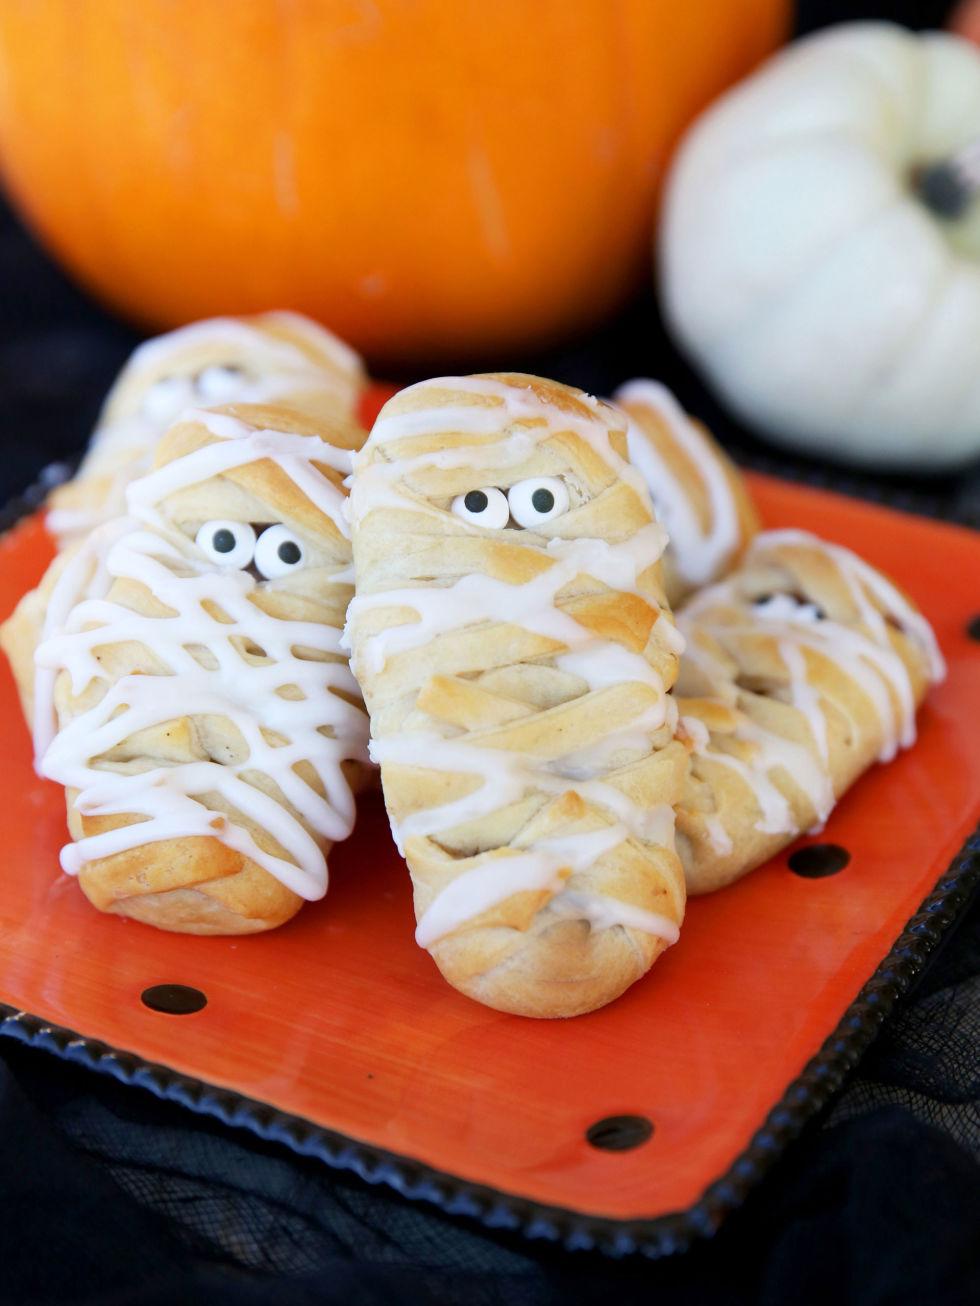 easy halloween breakfast recipes 10 halloween breakfast ideas - Halloween Casserole Recipe Ideas